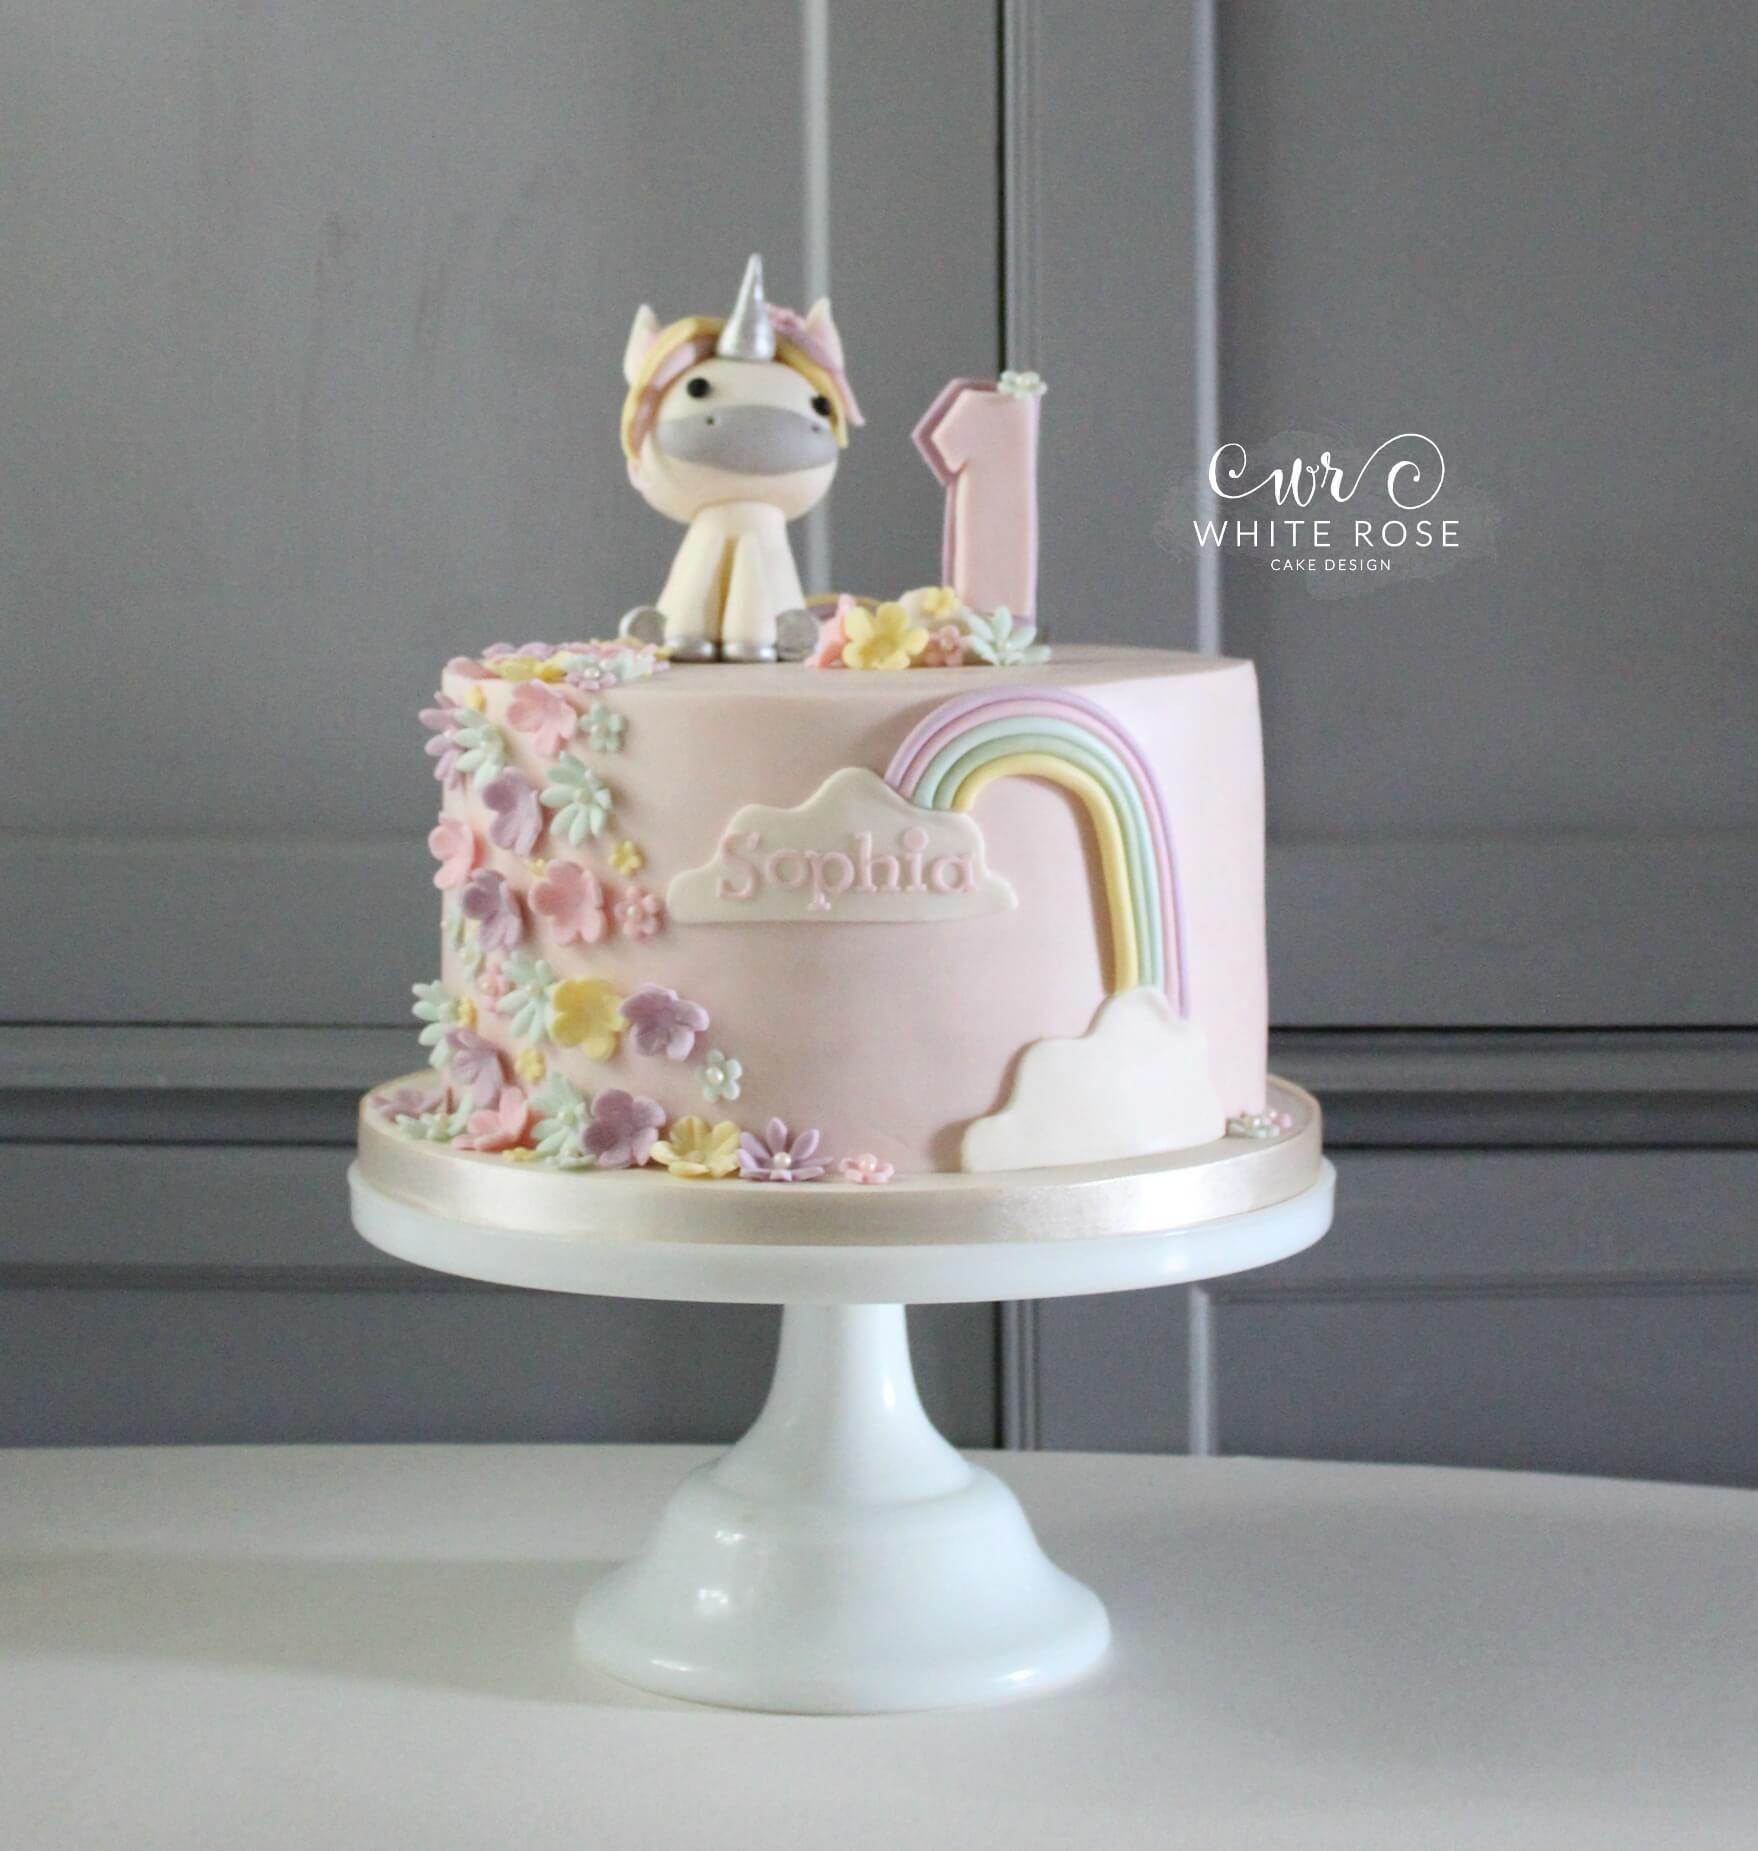 Unicorn 1st Birthday Cake White Rose Cake Design Cake Maker In Holmfirth West Yorkshire Birthday Cake Maker Baby Birthday Cakes 1st Birthday Cakes